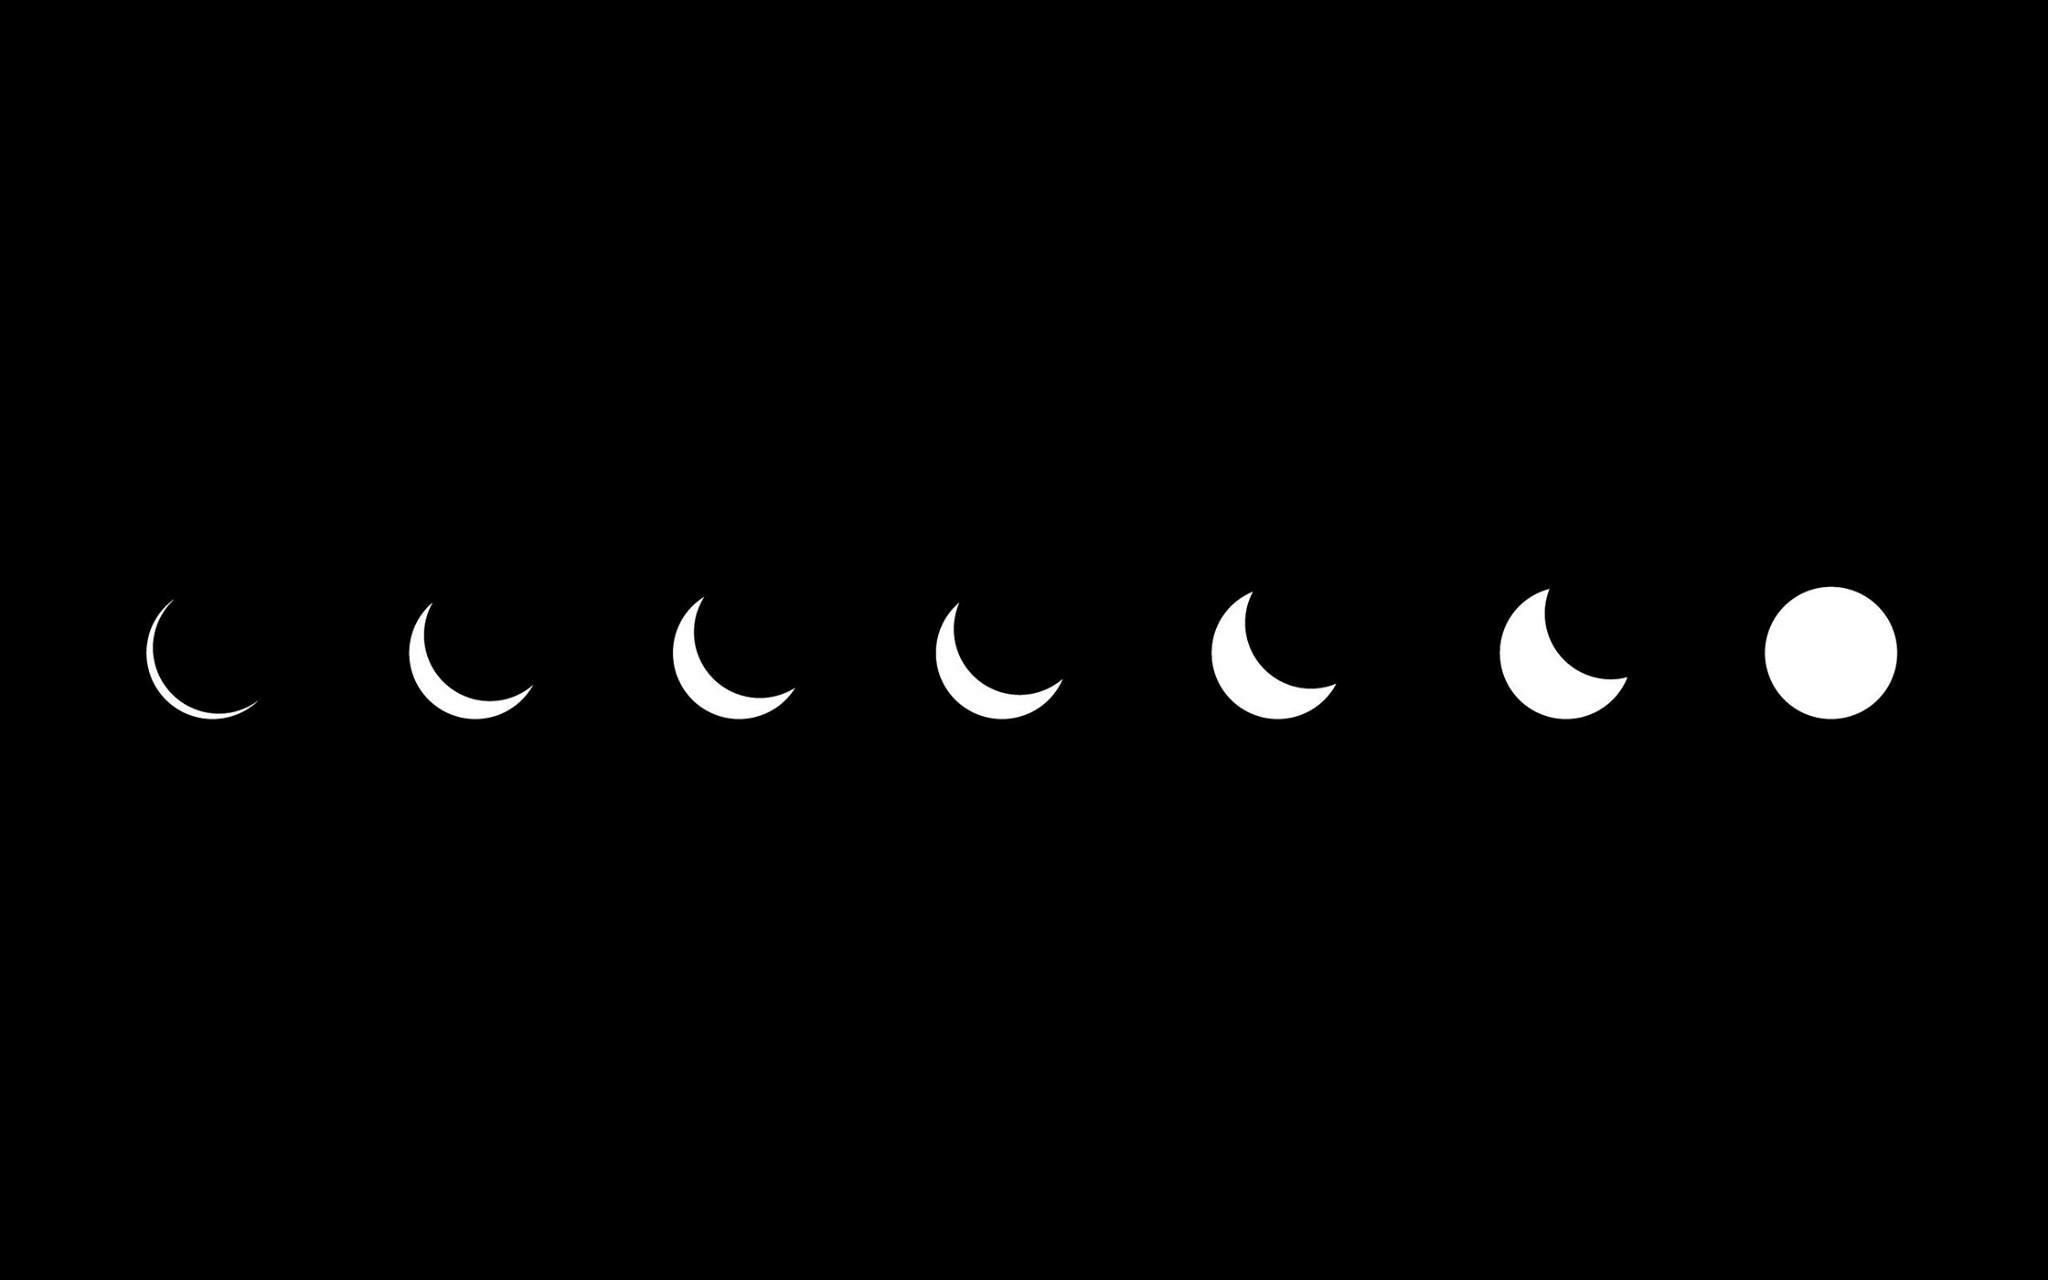 Dark Aesthetic Tumblr Desktop Wallpapers Top Free Dark